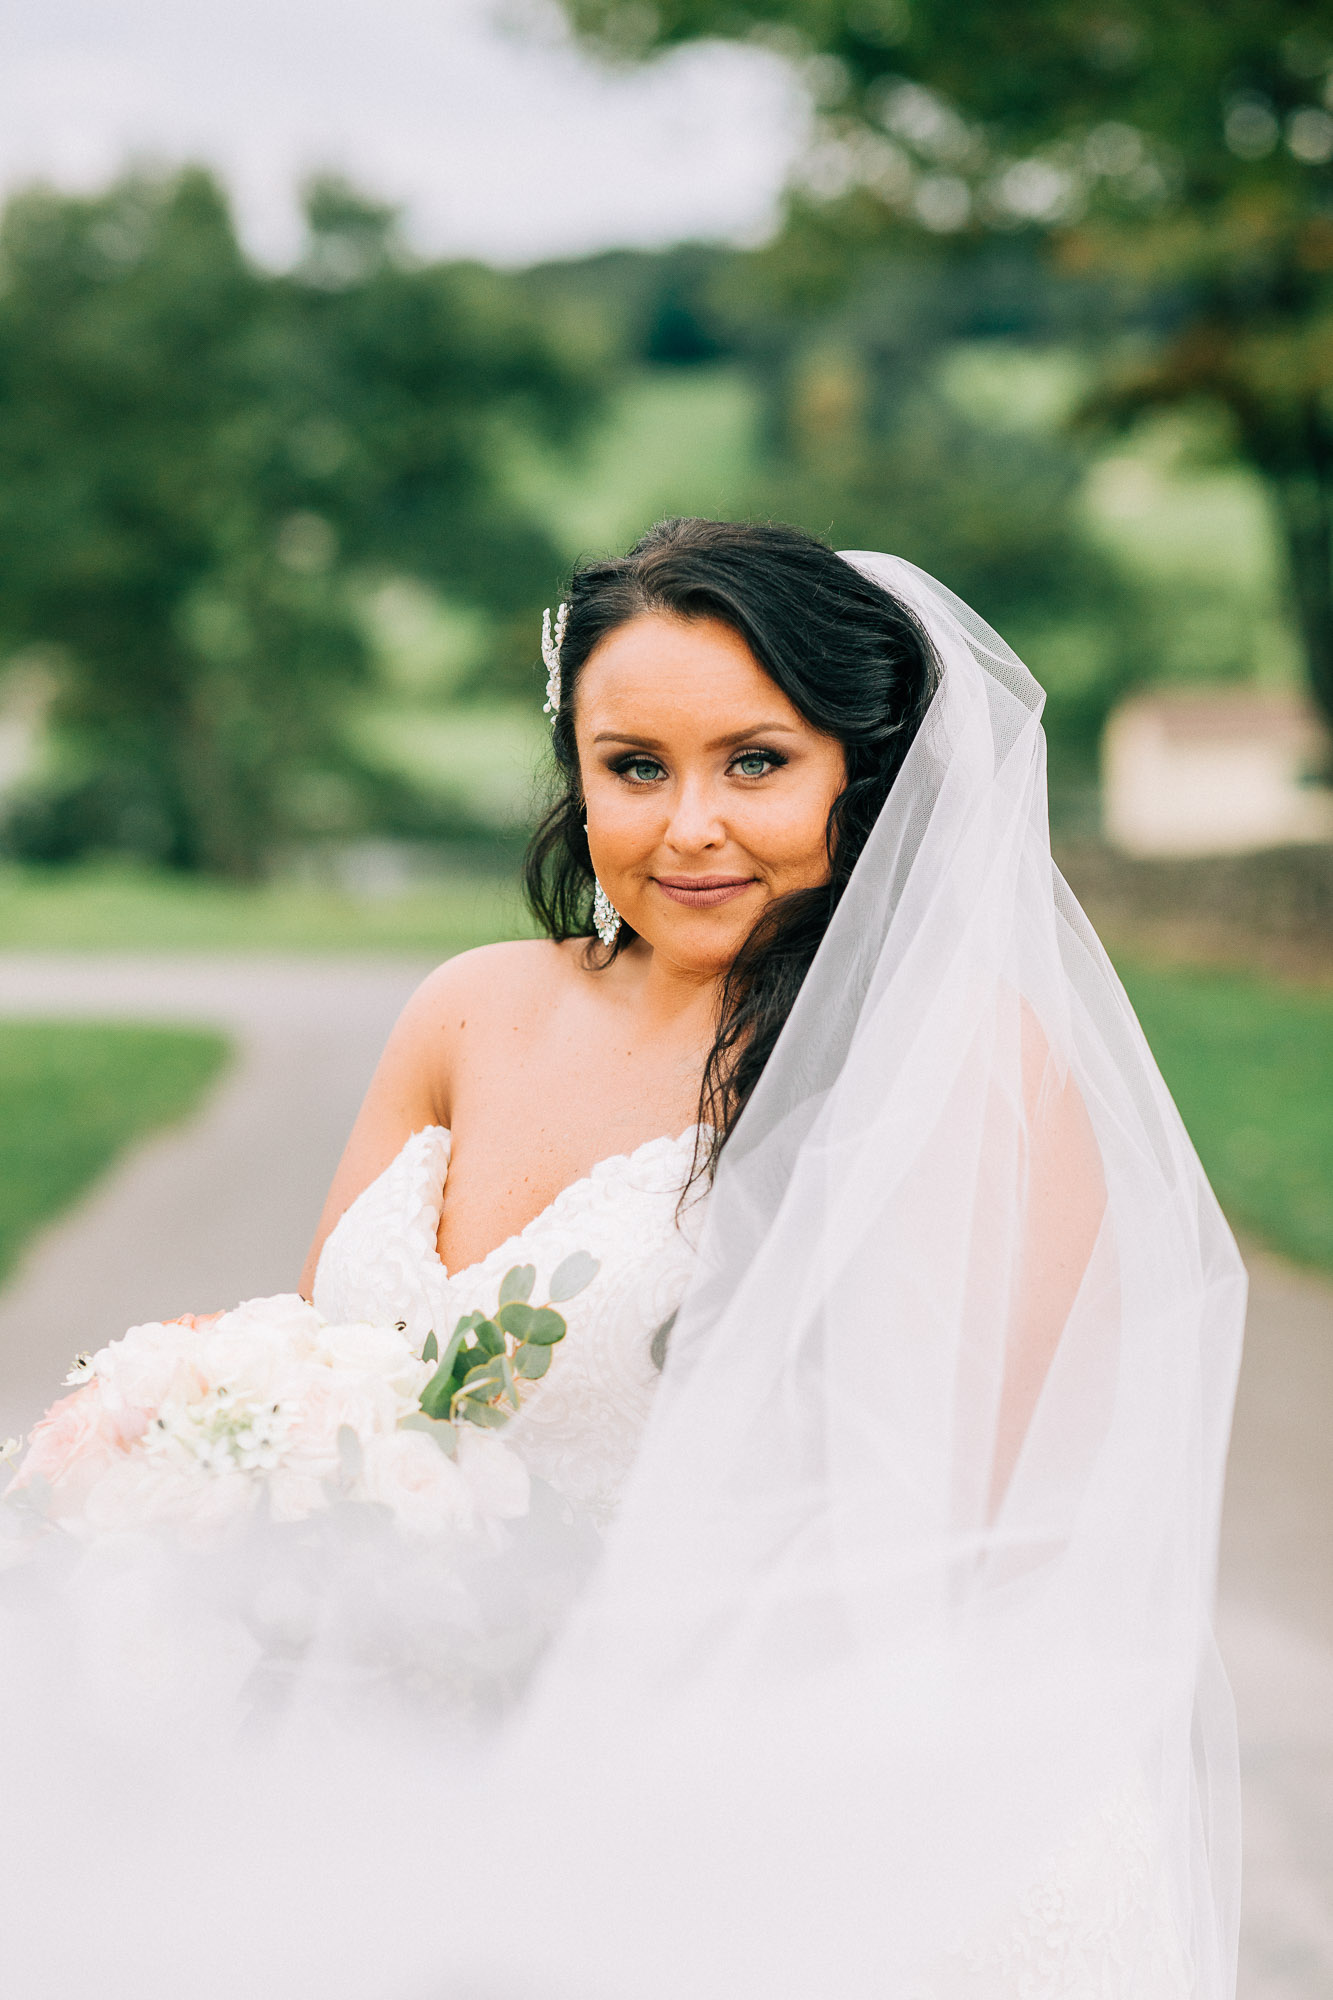 stonhedge-country-club-wedding-8641.jpg